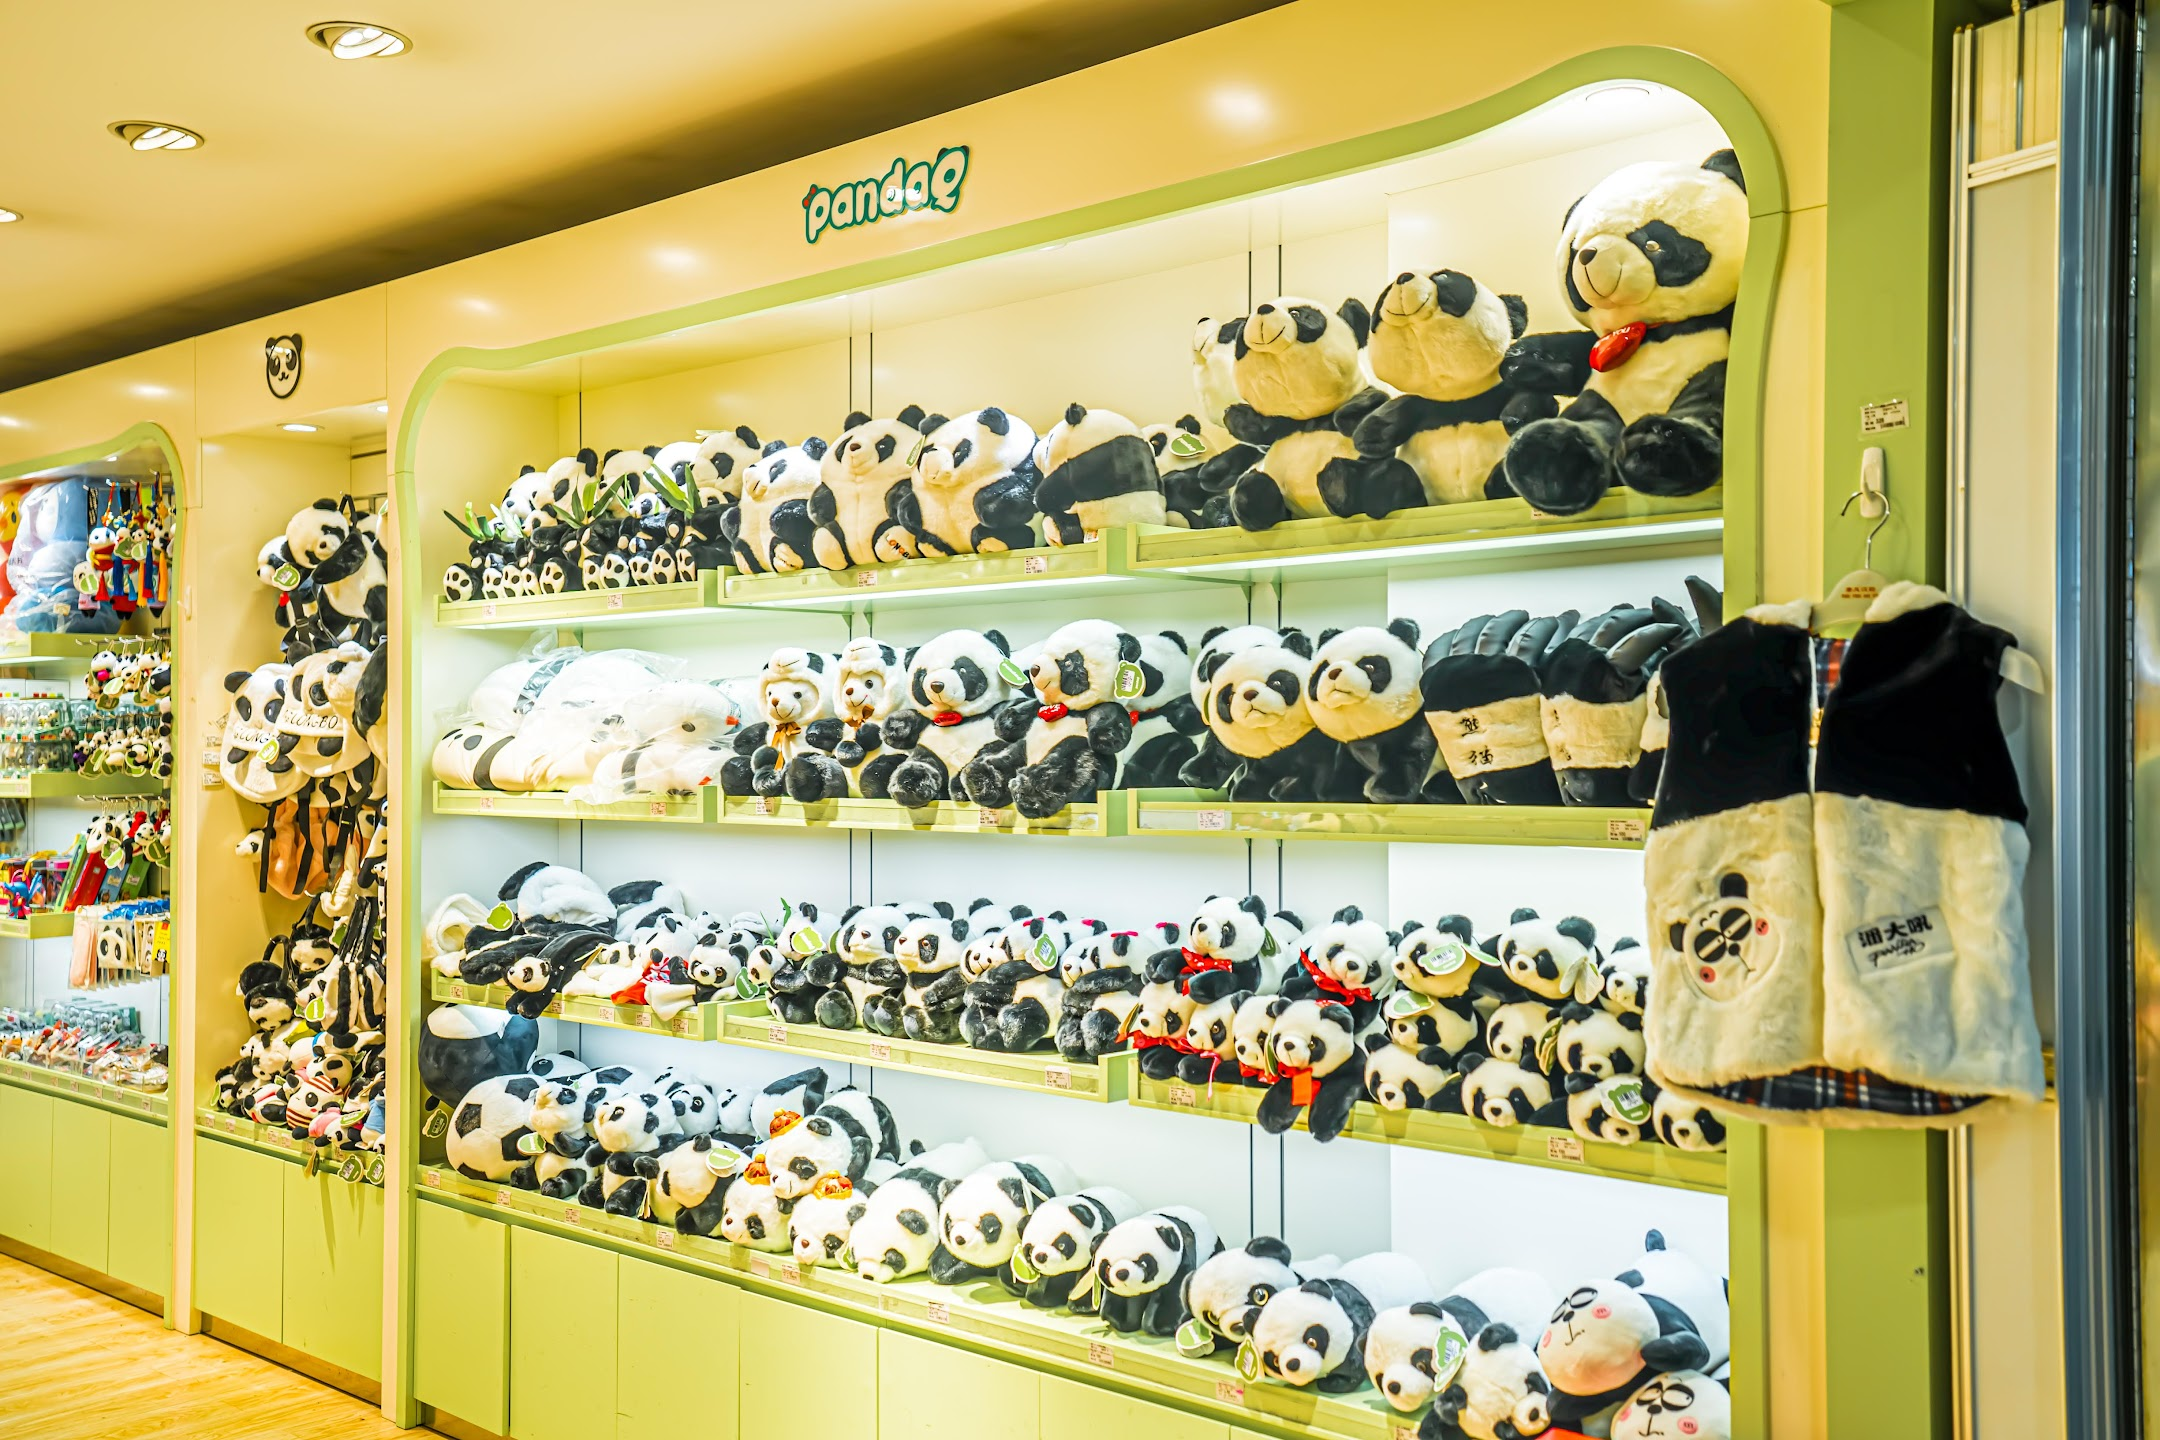 Shanghai Pudong International Airport Panda2